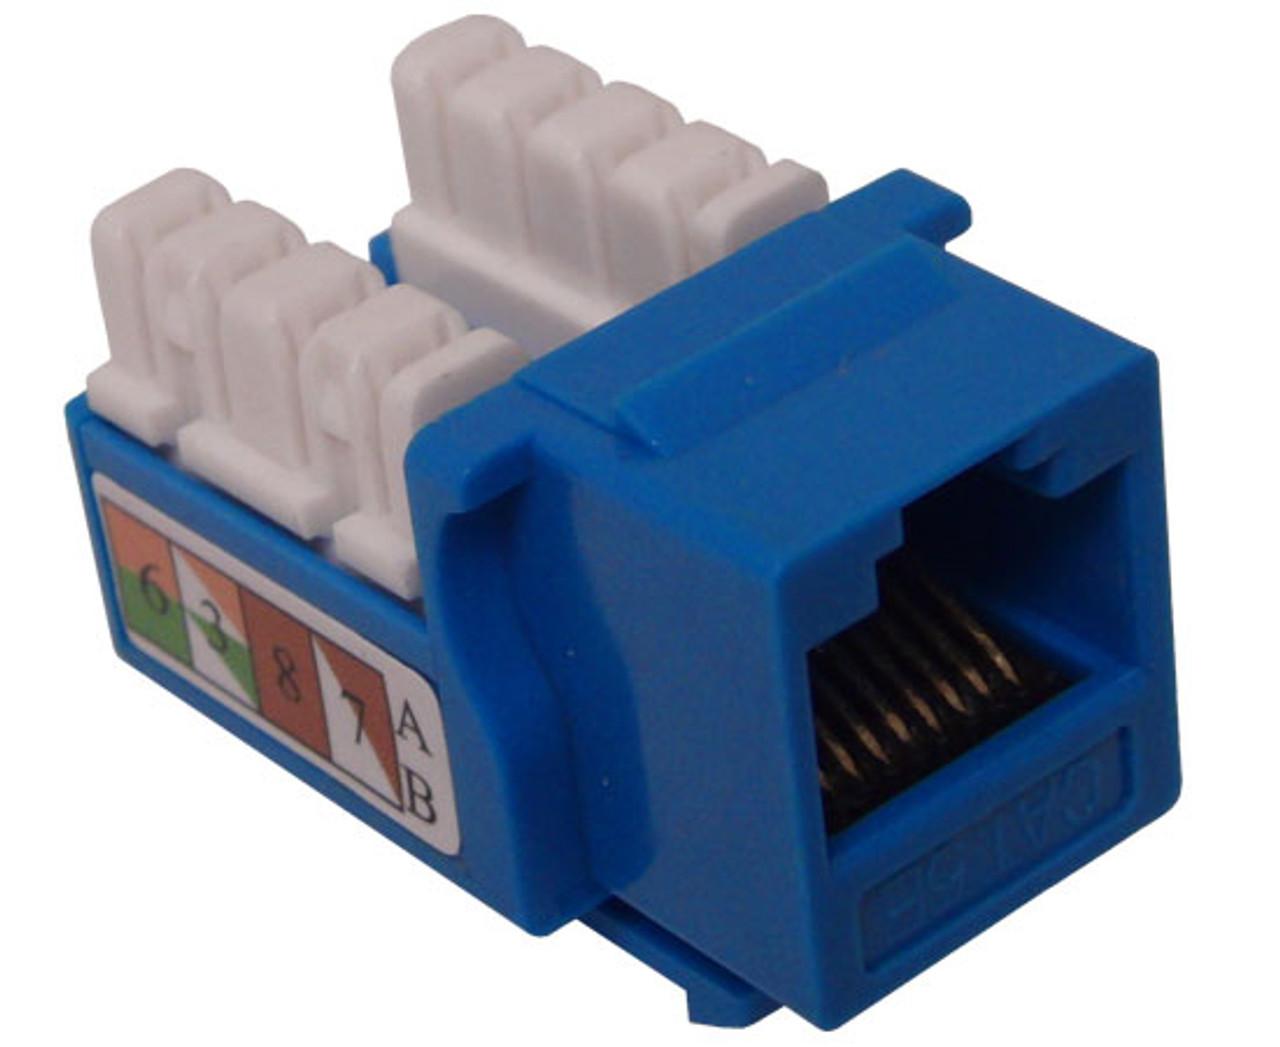 category 6 keystone computer jacks cablesupply blue rj45 computer jack cat6 110 punch down cablesupply [ 1280 x 1047 Pixel ]